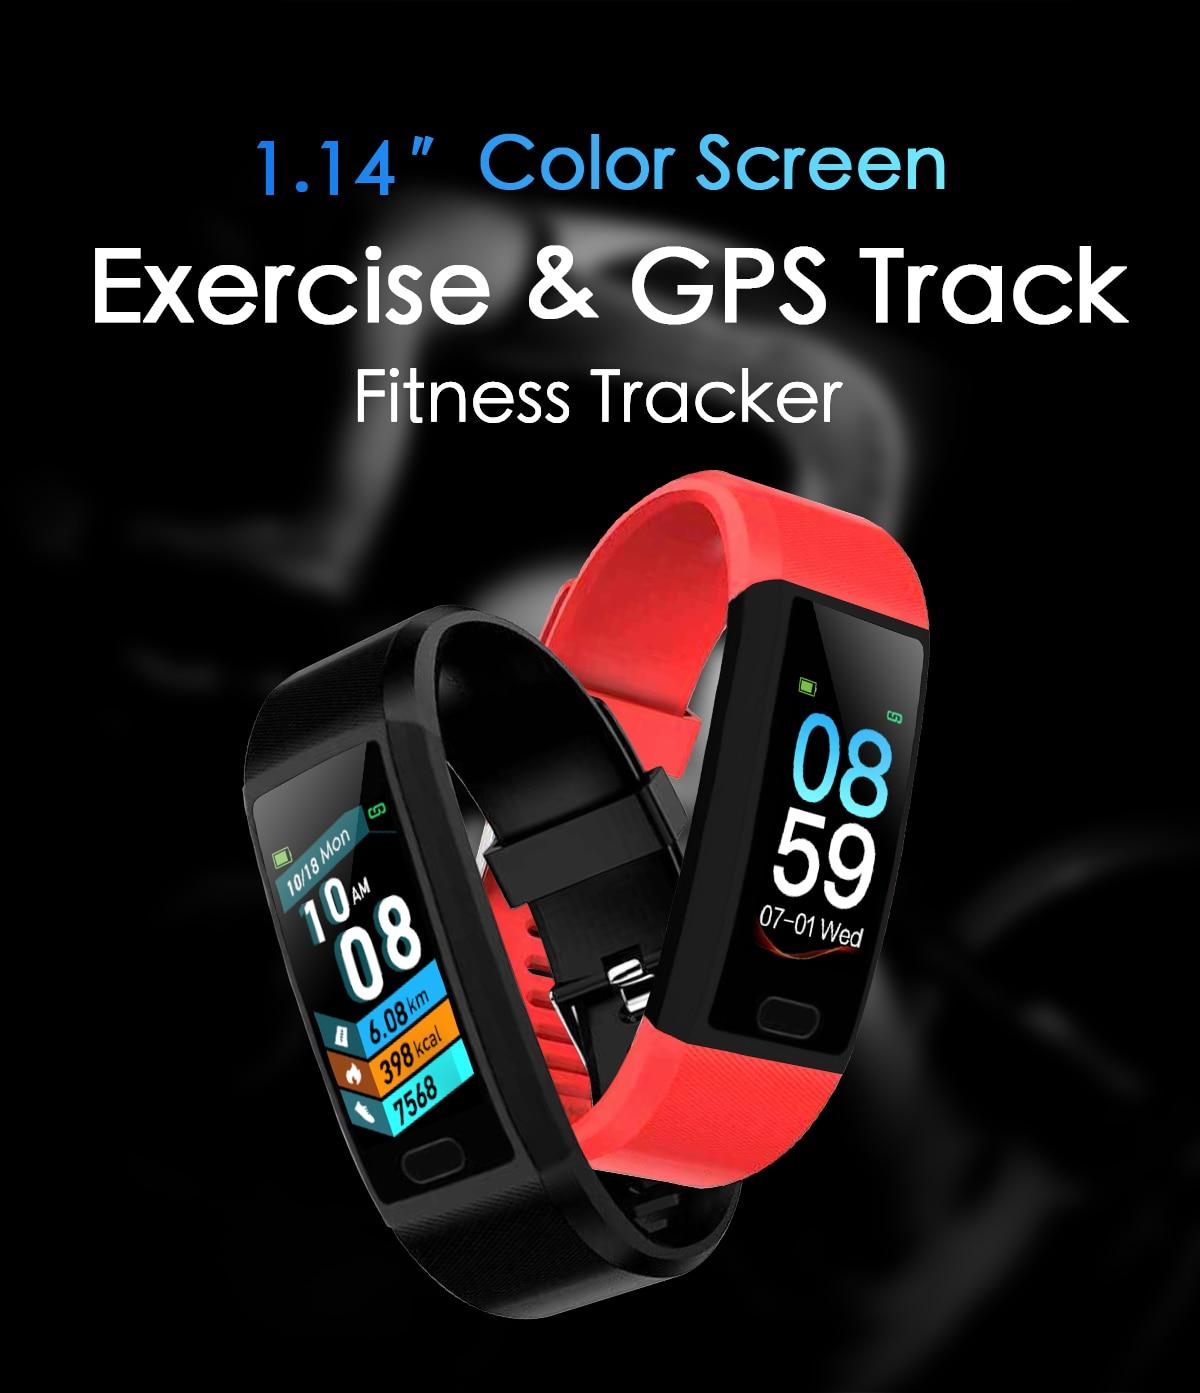 Inteligente Pulseira de Relógio Monitor de Freqüência Cardíaca IP67 Banda Inteligente Pulseira Pulseira De Fitness Rastreador Esporte Relógio Inteligente Relógio Inteligente